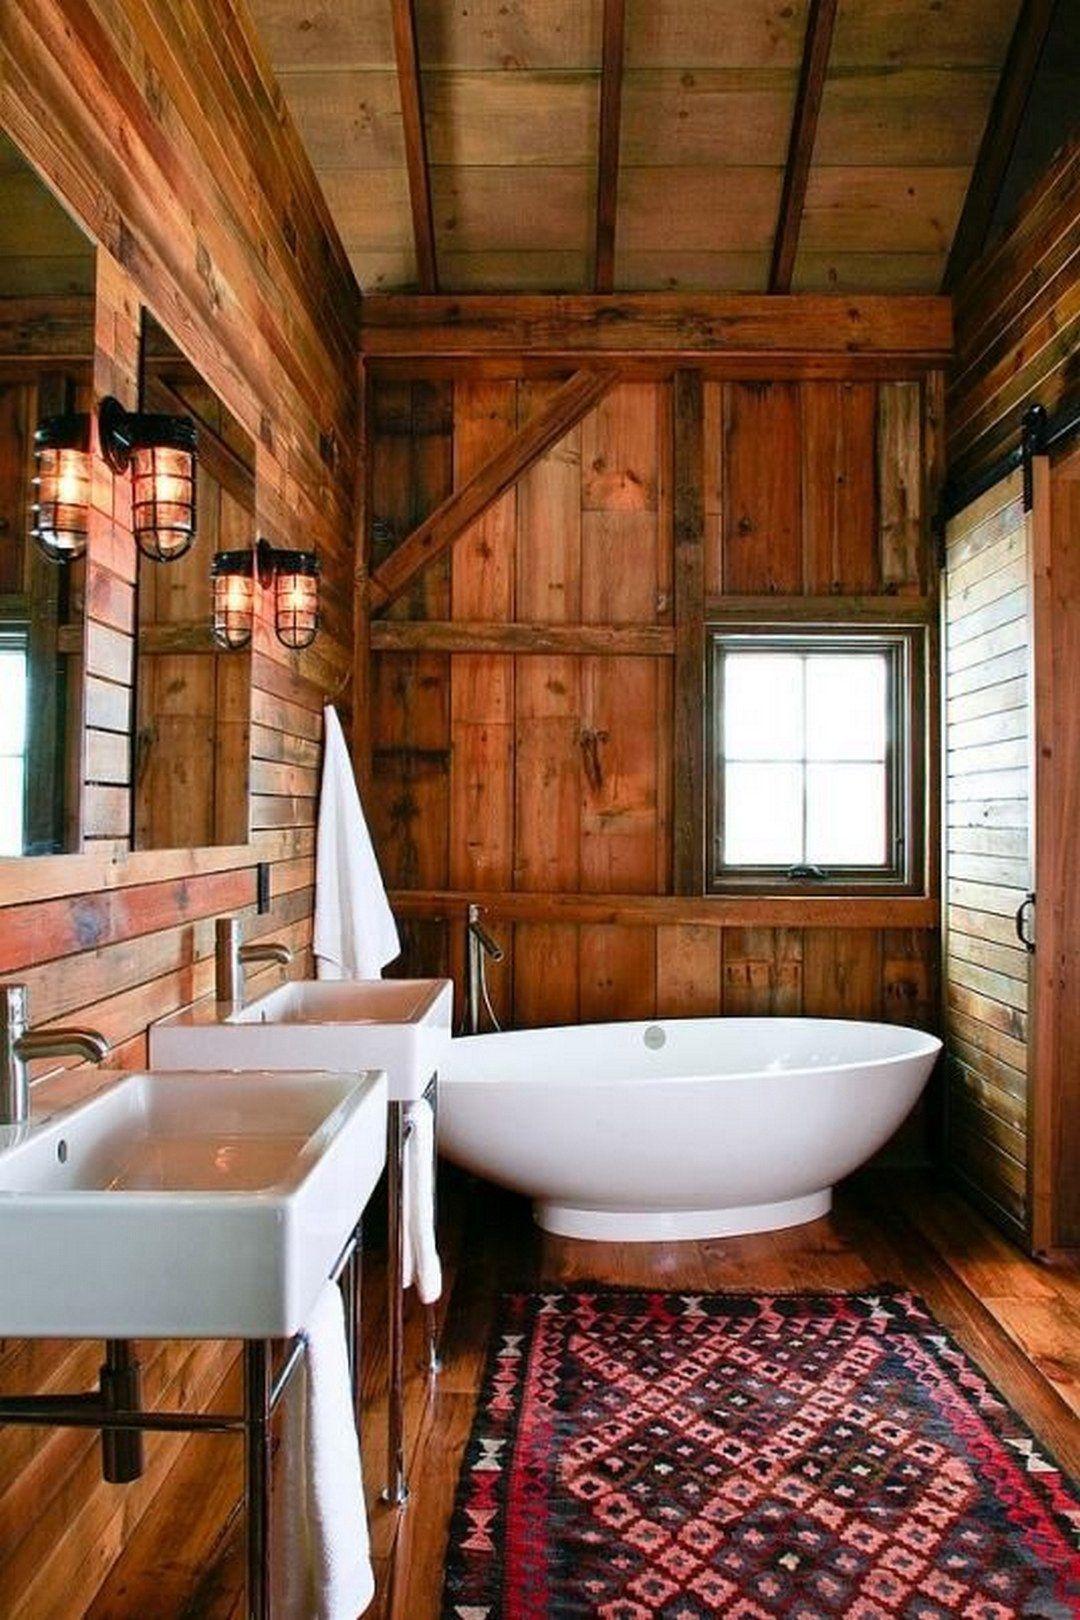 Log home interior ideas  excellent cabin style decoration ideas  pinterest  cabin